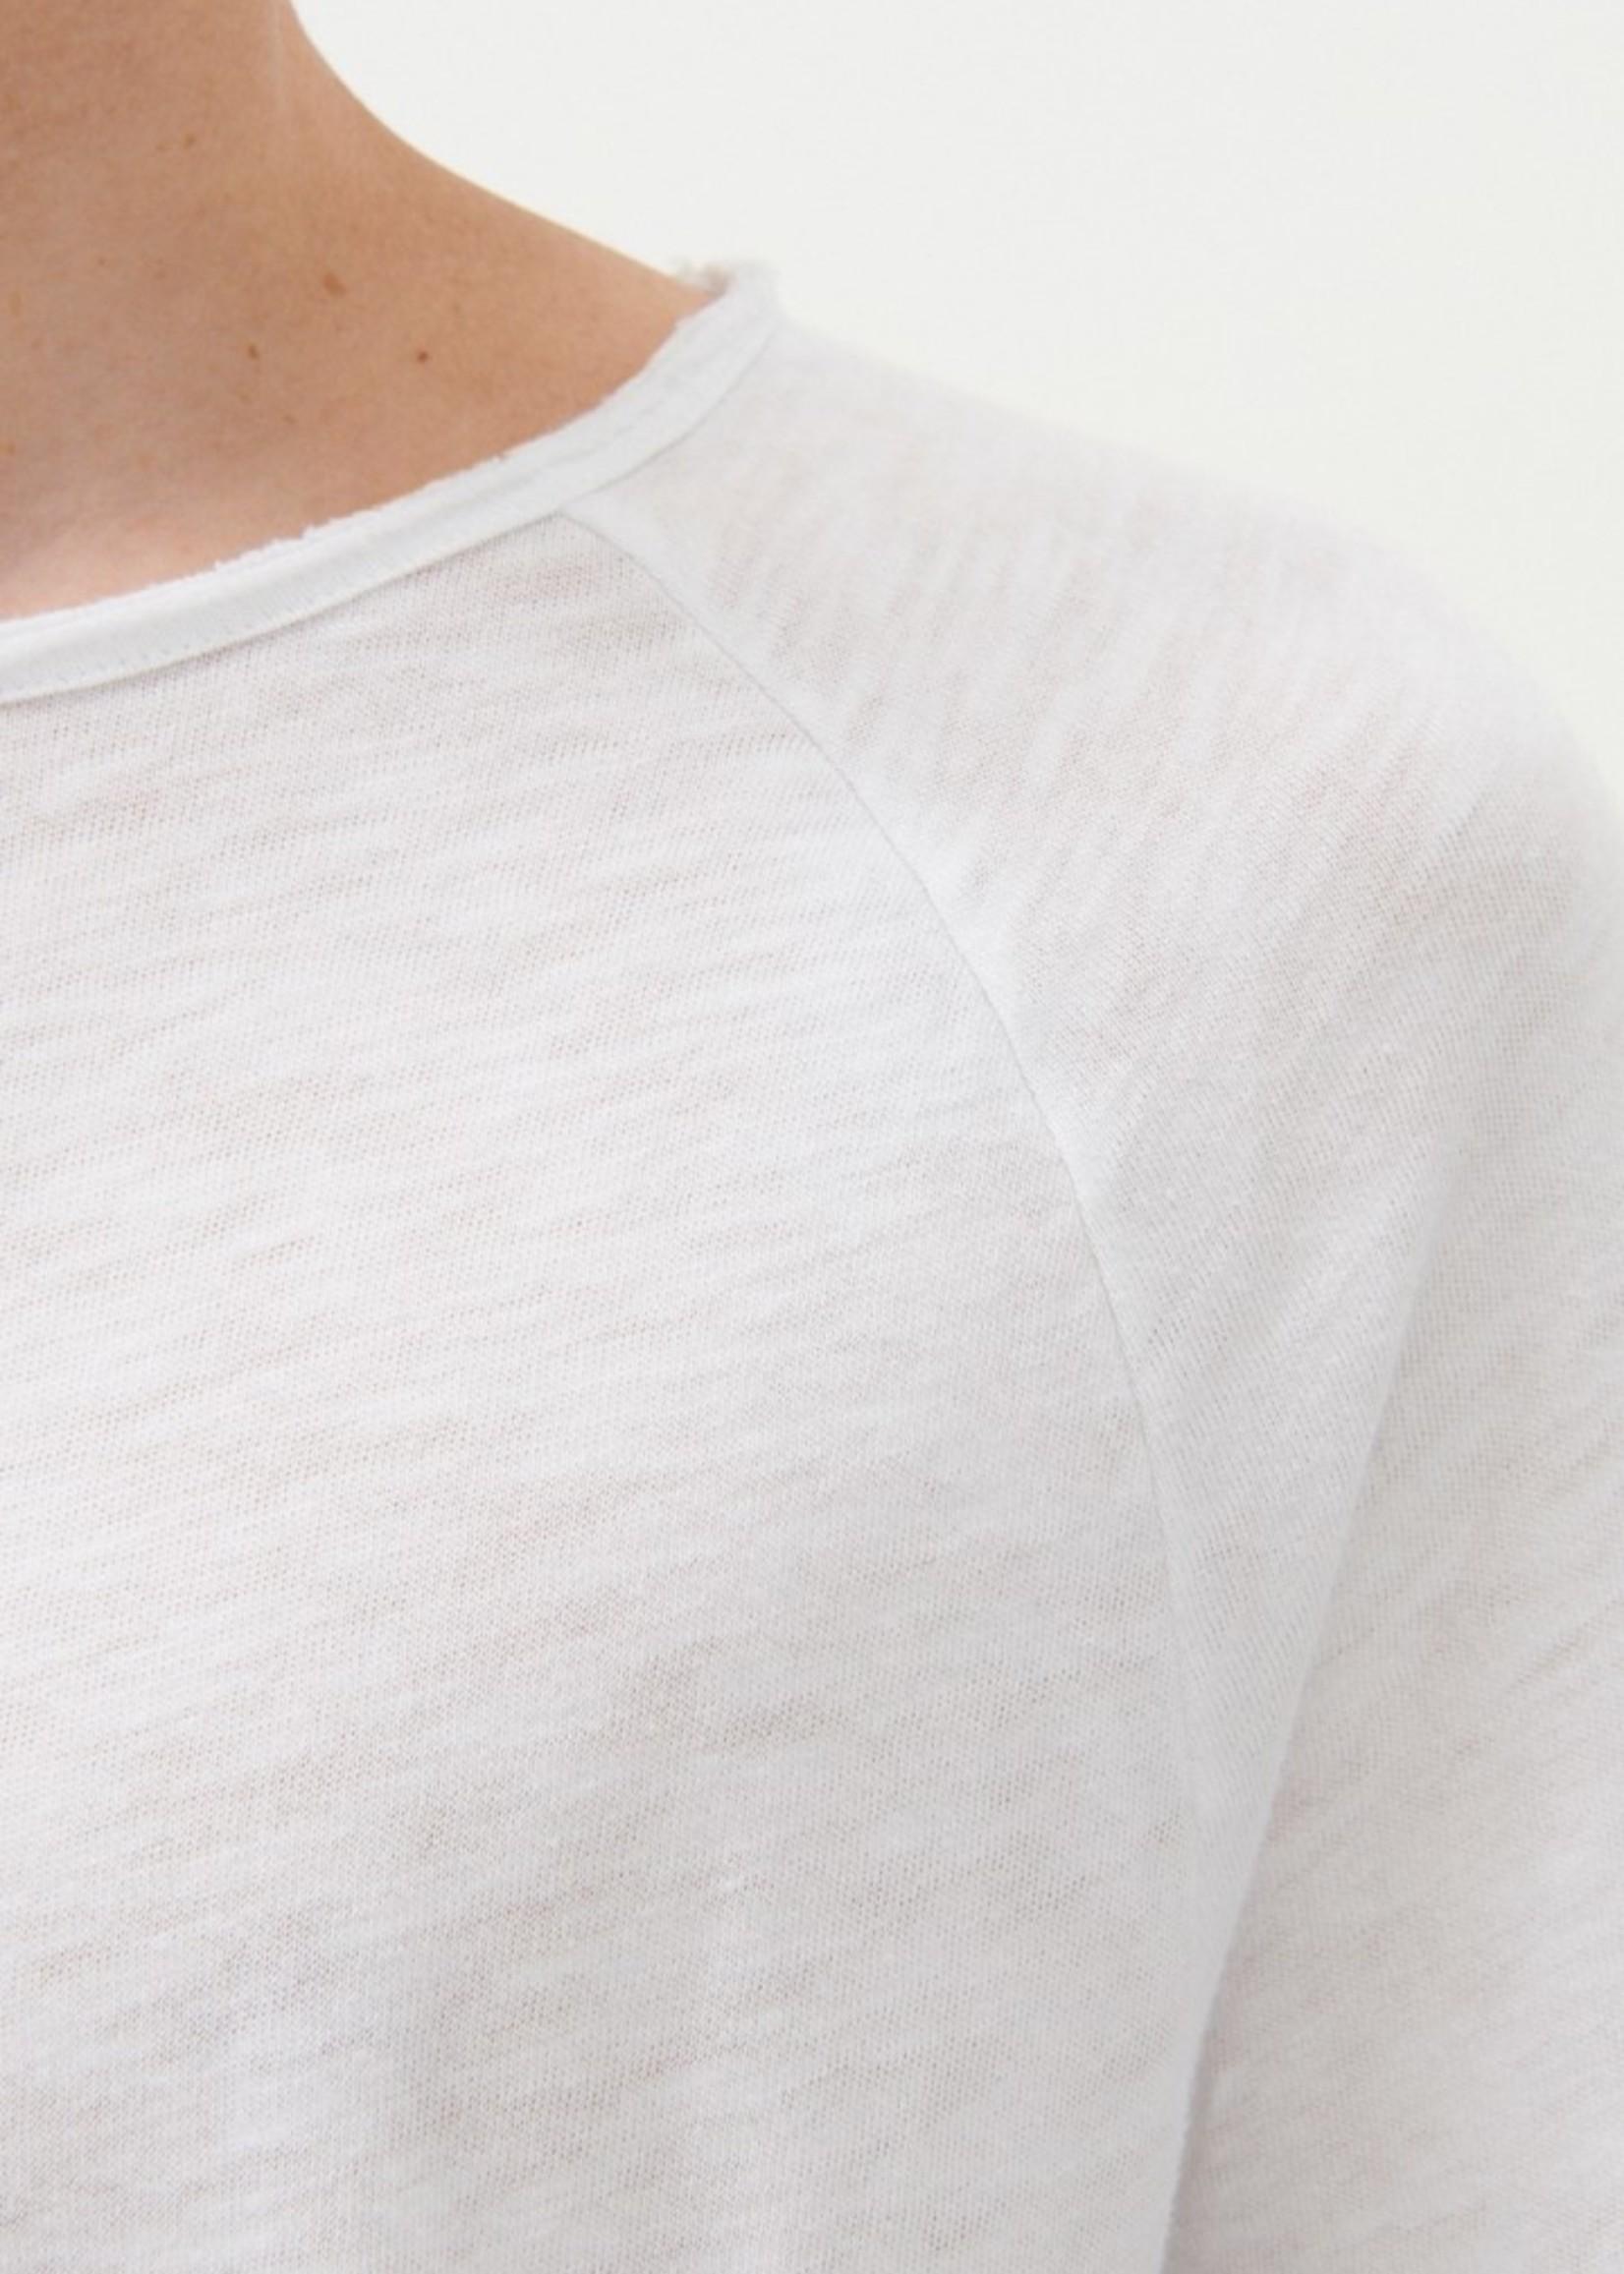 American Vintage Sonoma T-Shirt